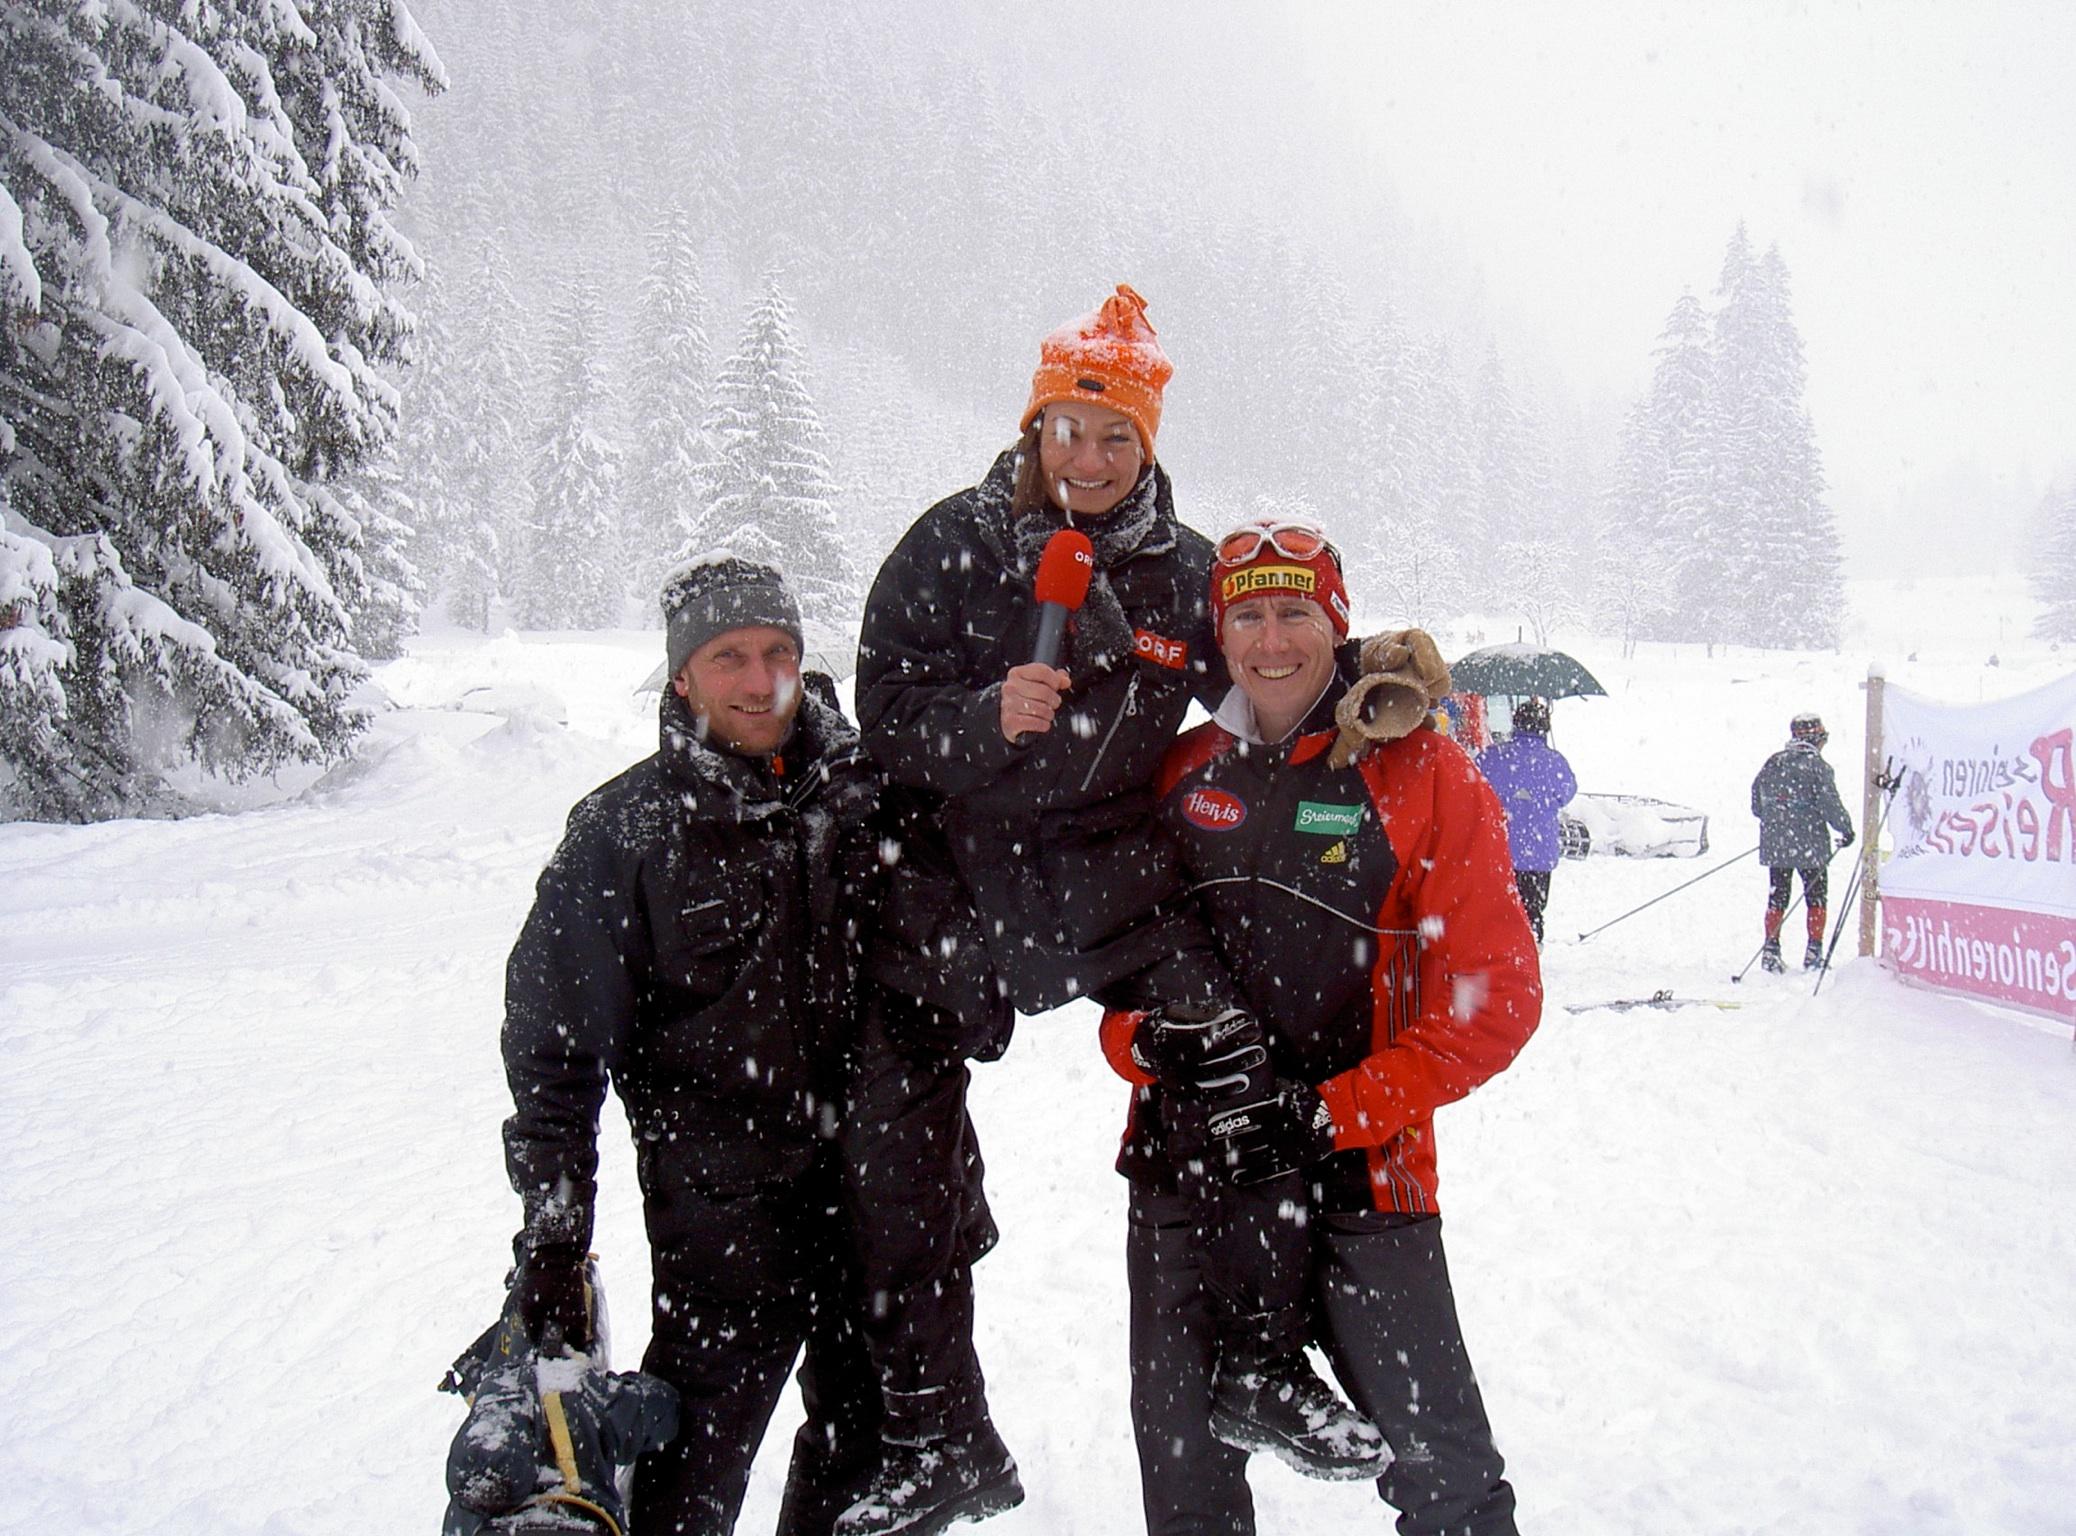 Langlauftipps mit Louis Stadlober